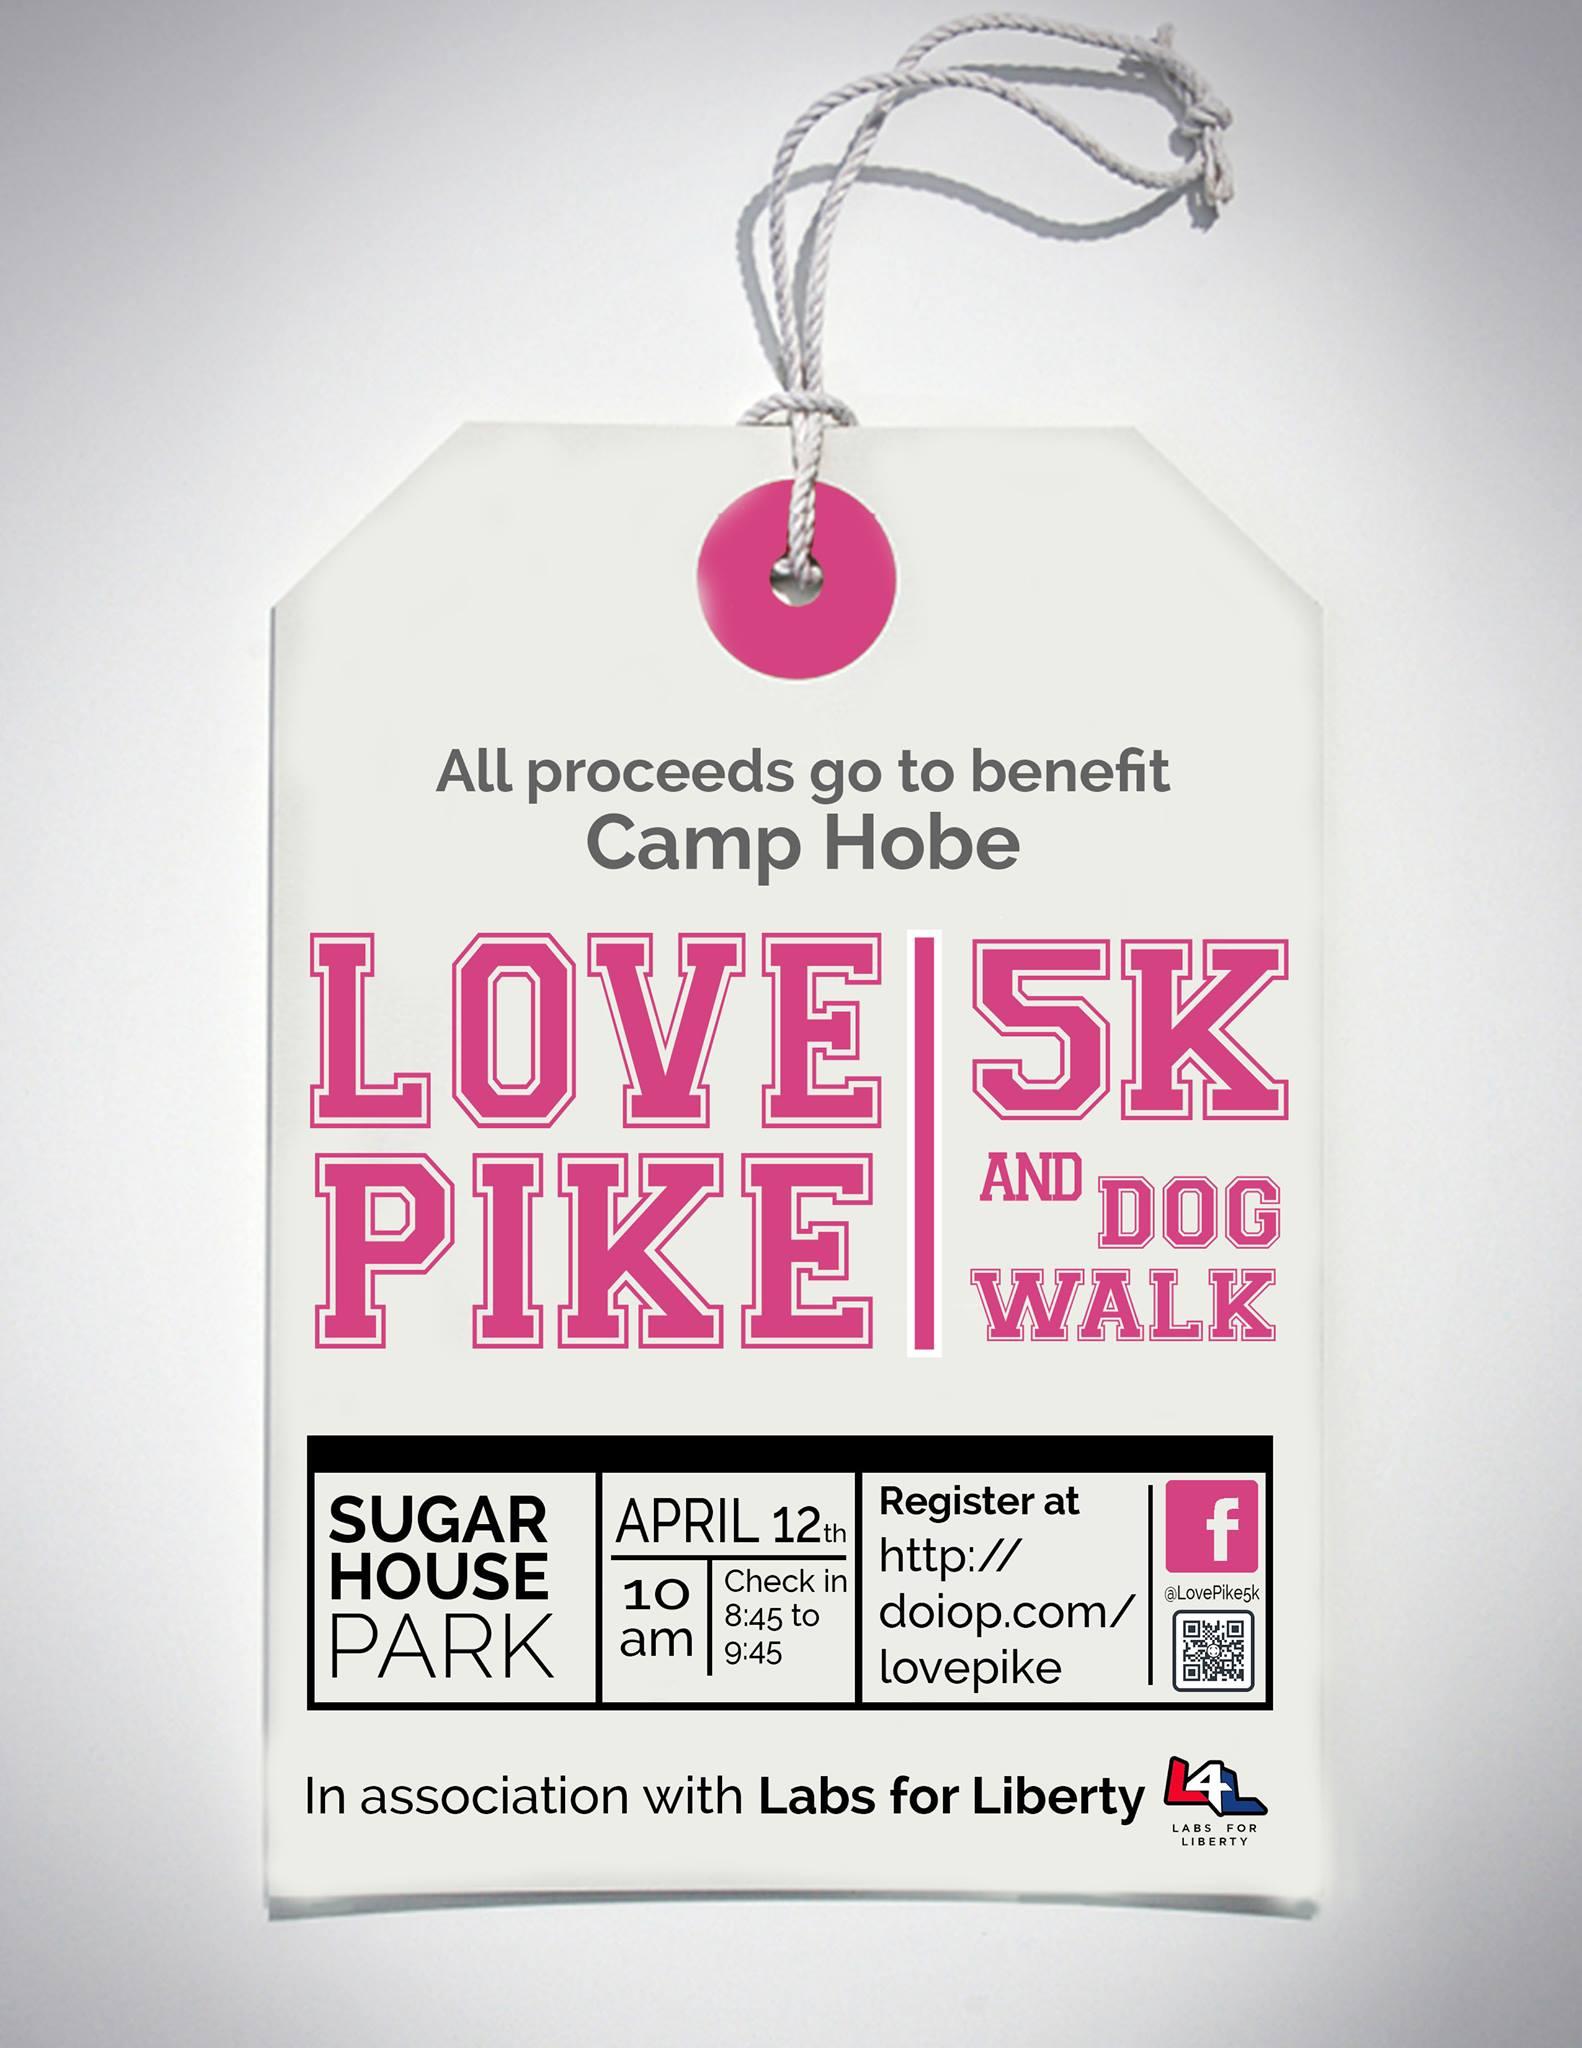 images.raceentry.com/infopages/love-pike-5kdog-walk-infopages-664.jpg